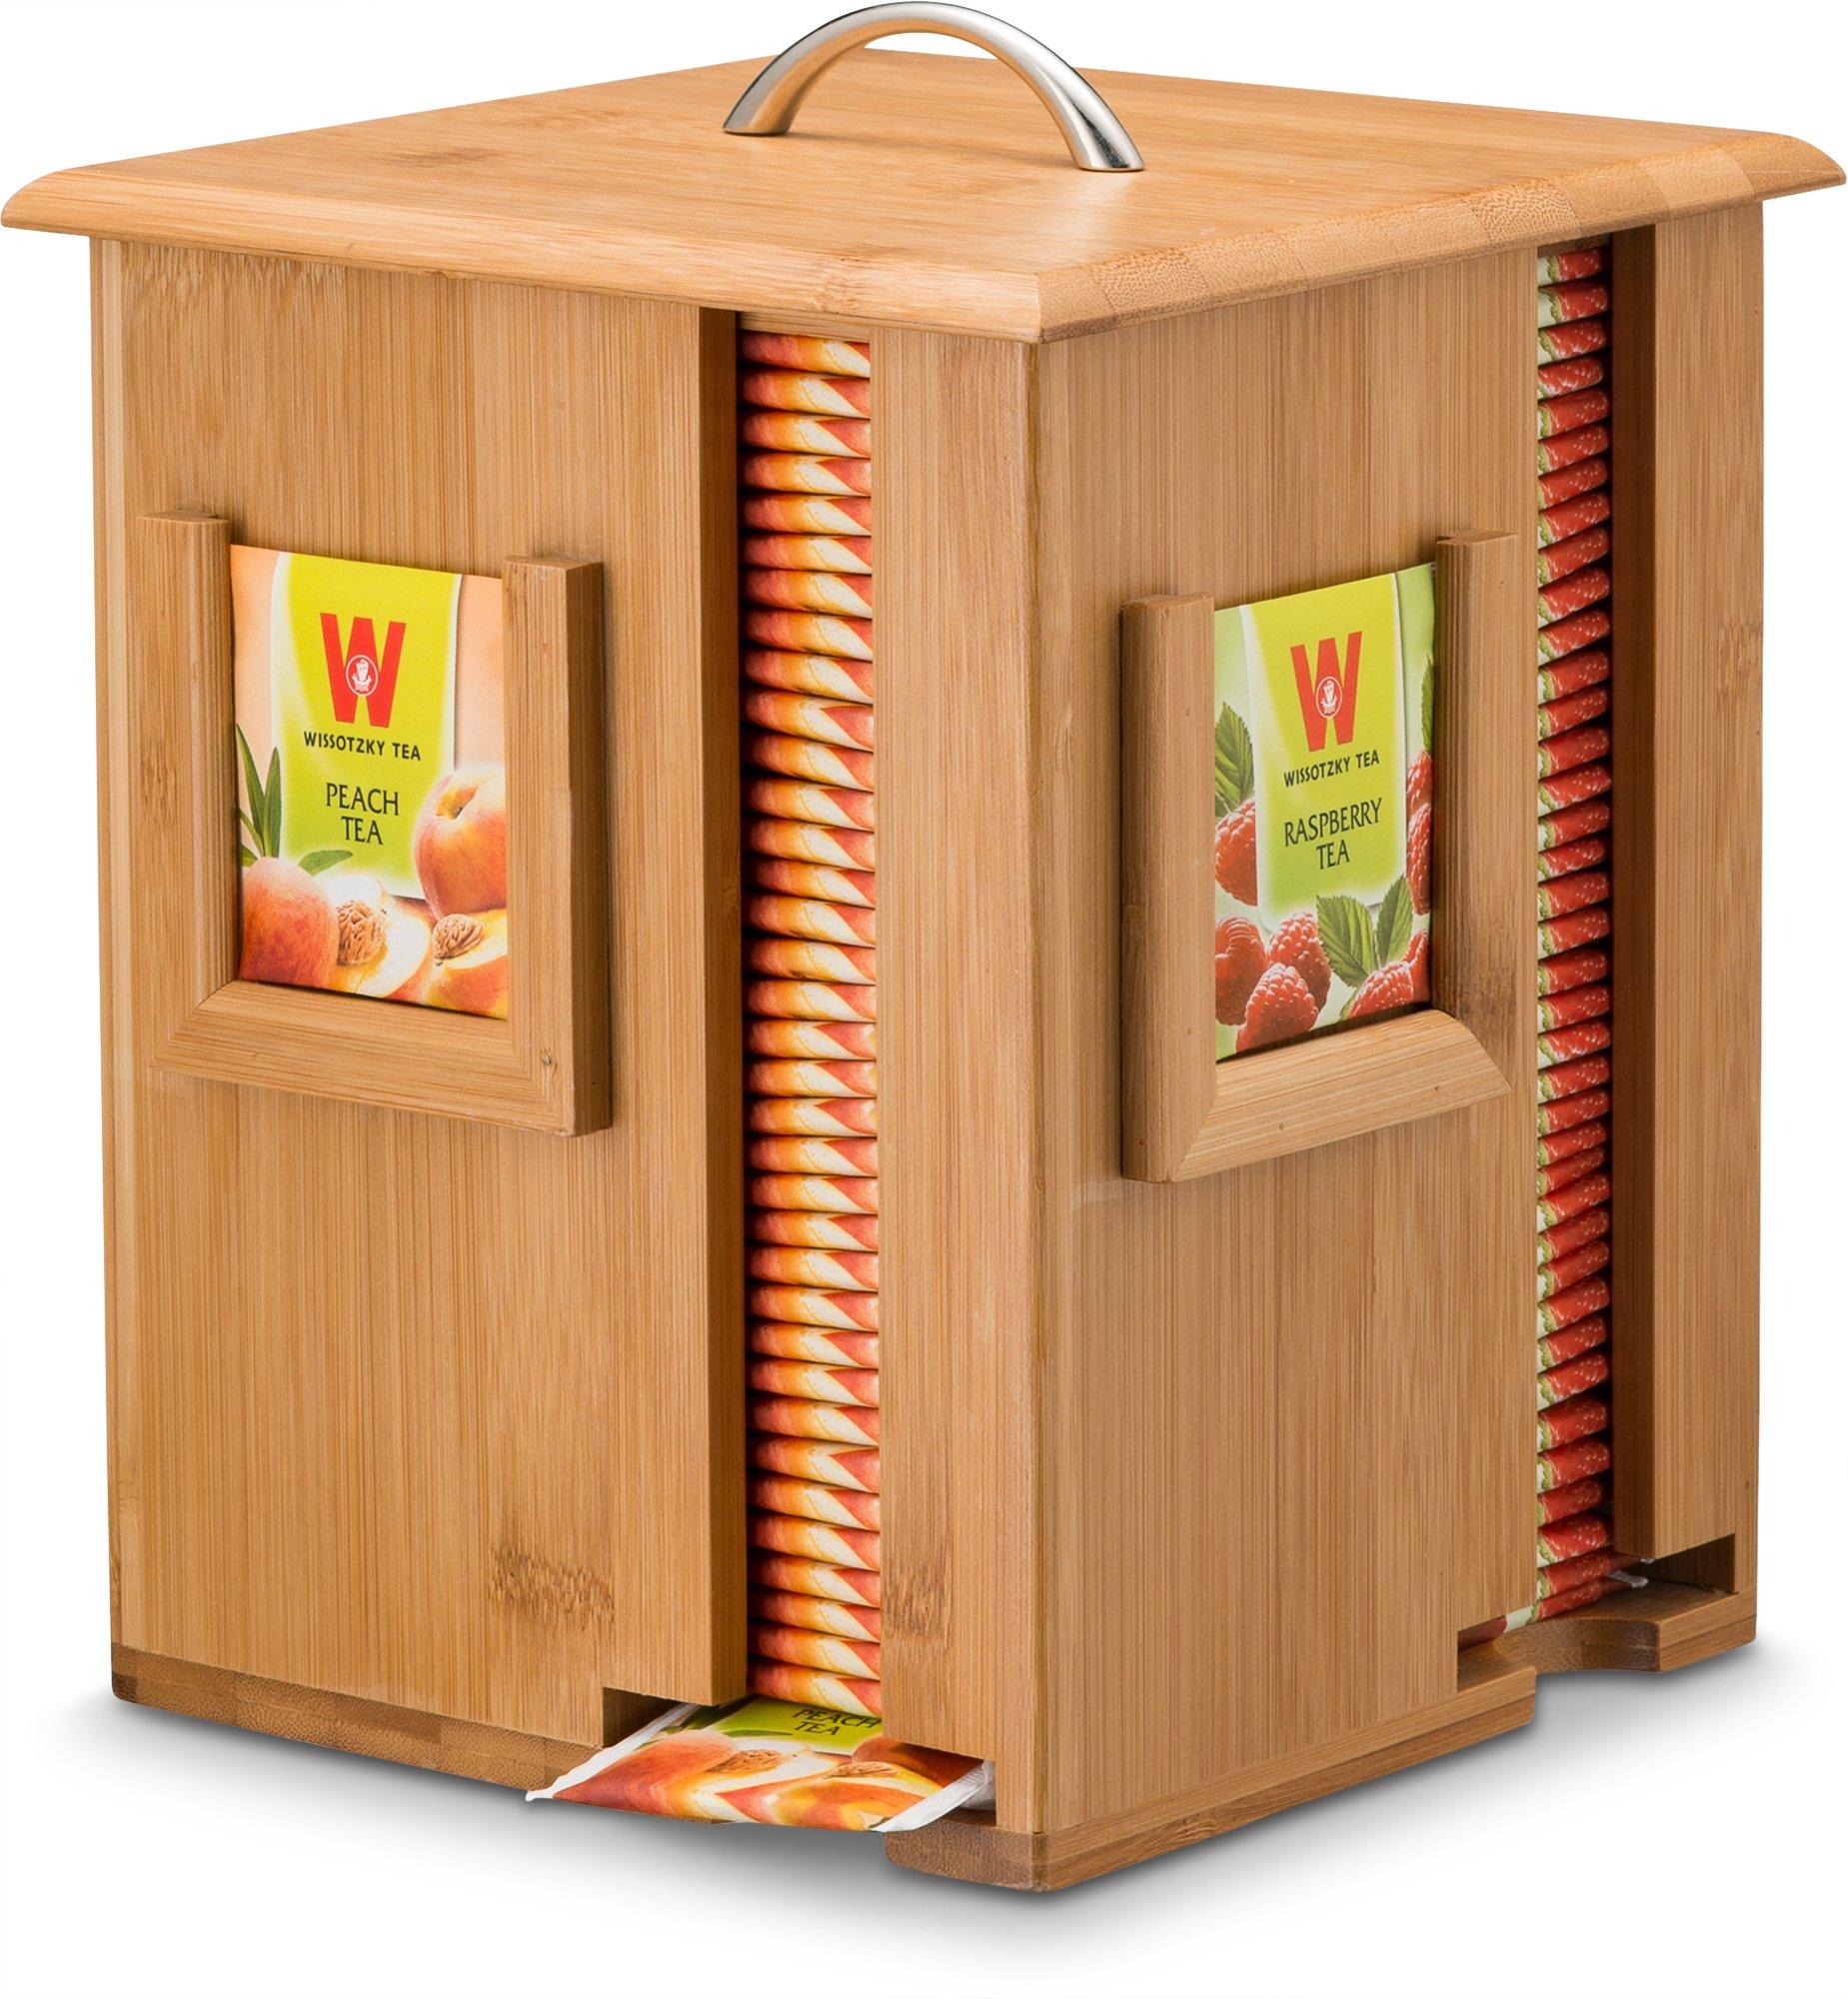 Natural Bamboo Tea Holder Organizer - 4 Storage Sections Rotating Dispenser Wooden Tea Box - Perfect Gift Idea by Bambüsi